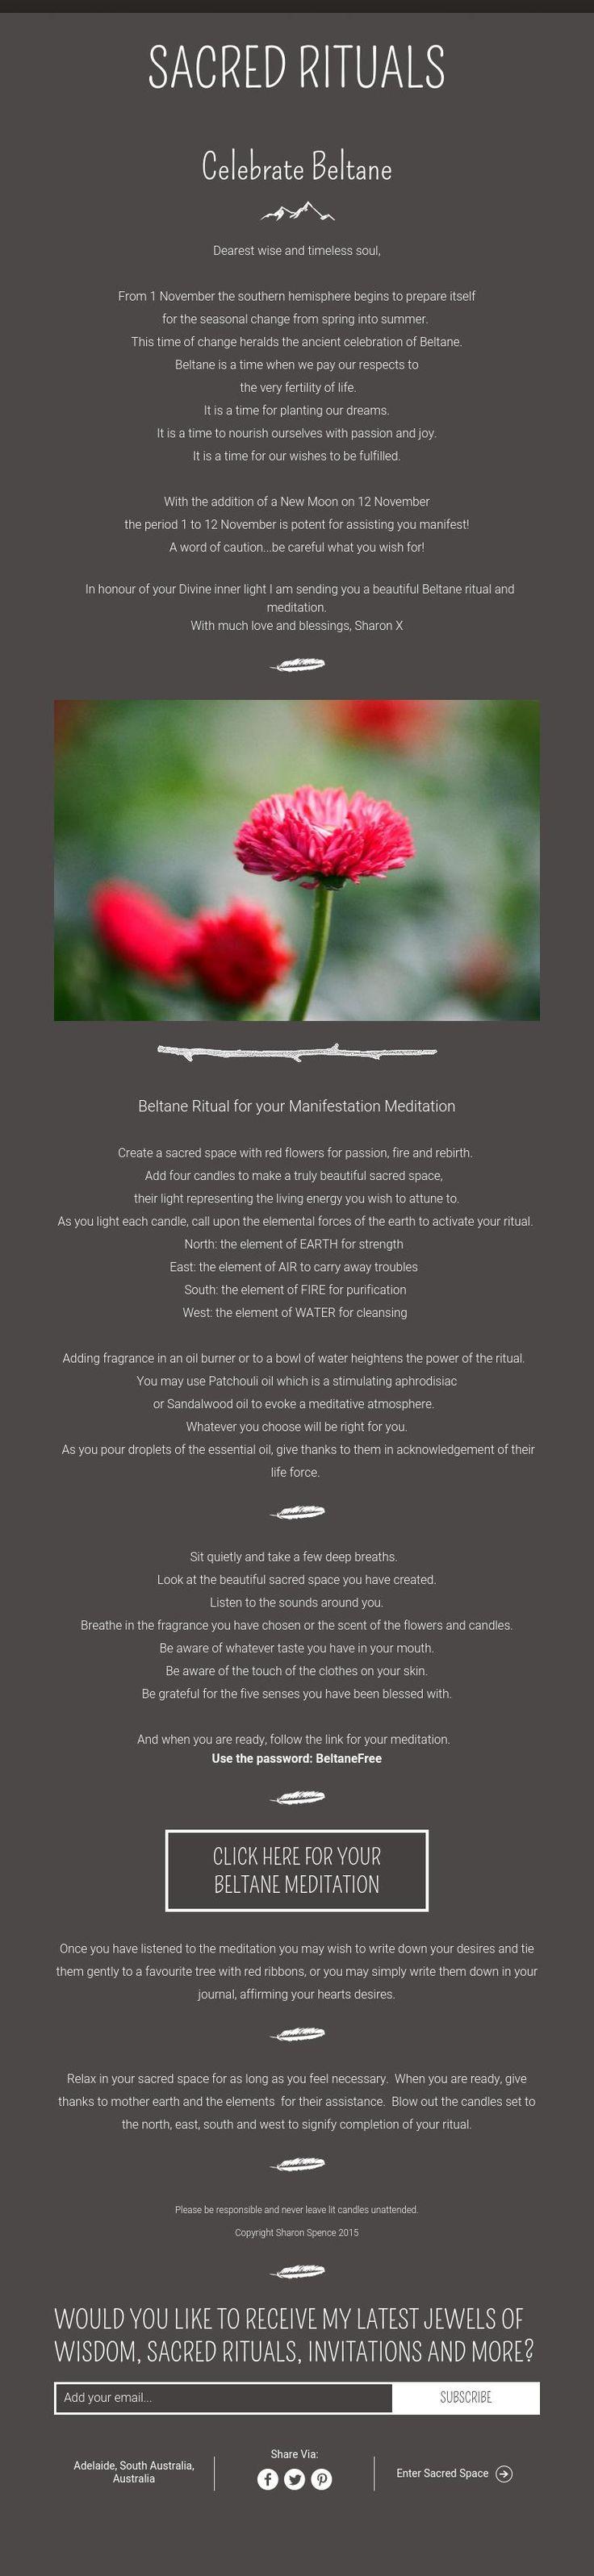 Beltaine: Sacred Rituals ~ Celebrate #beltane